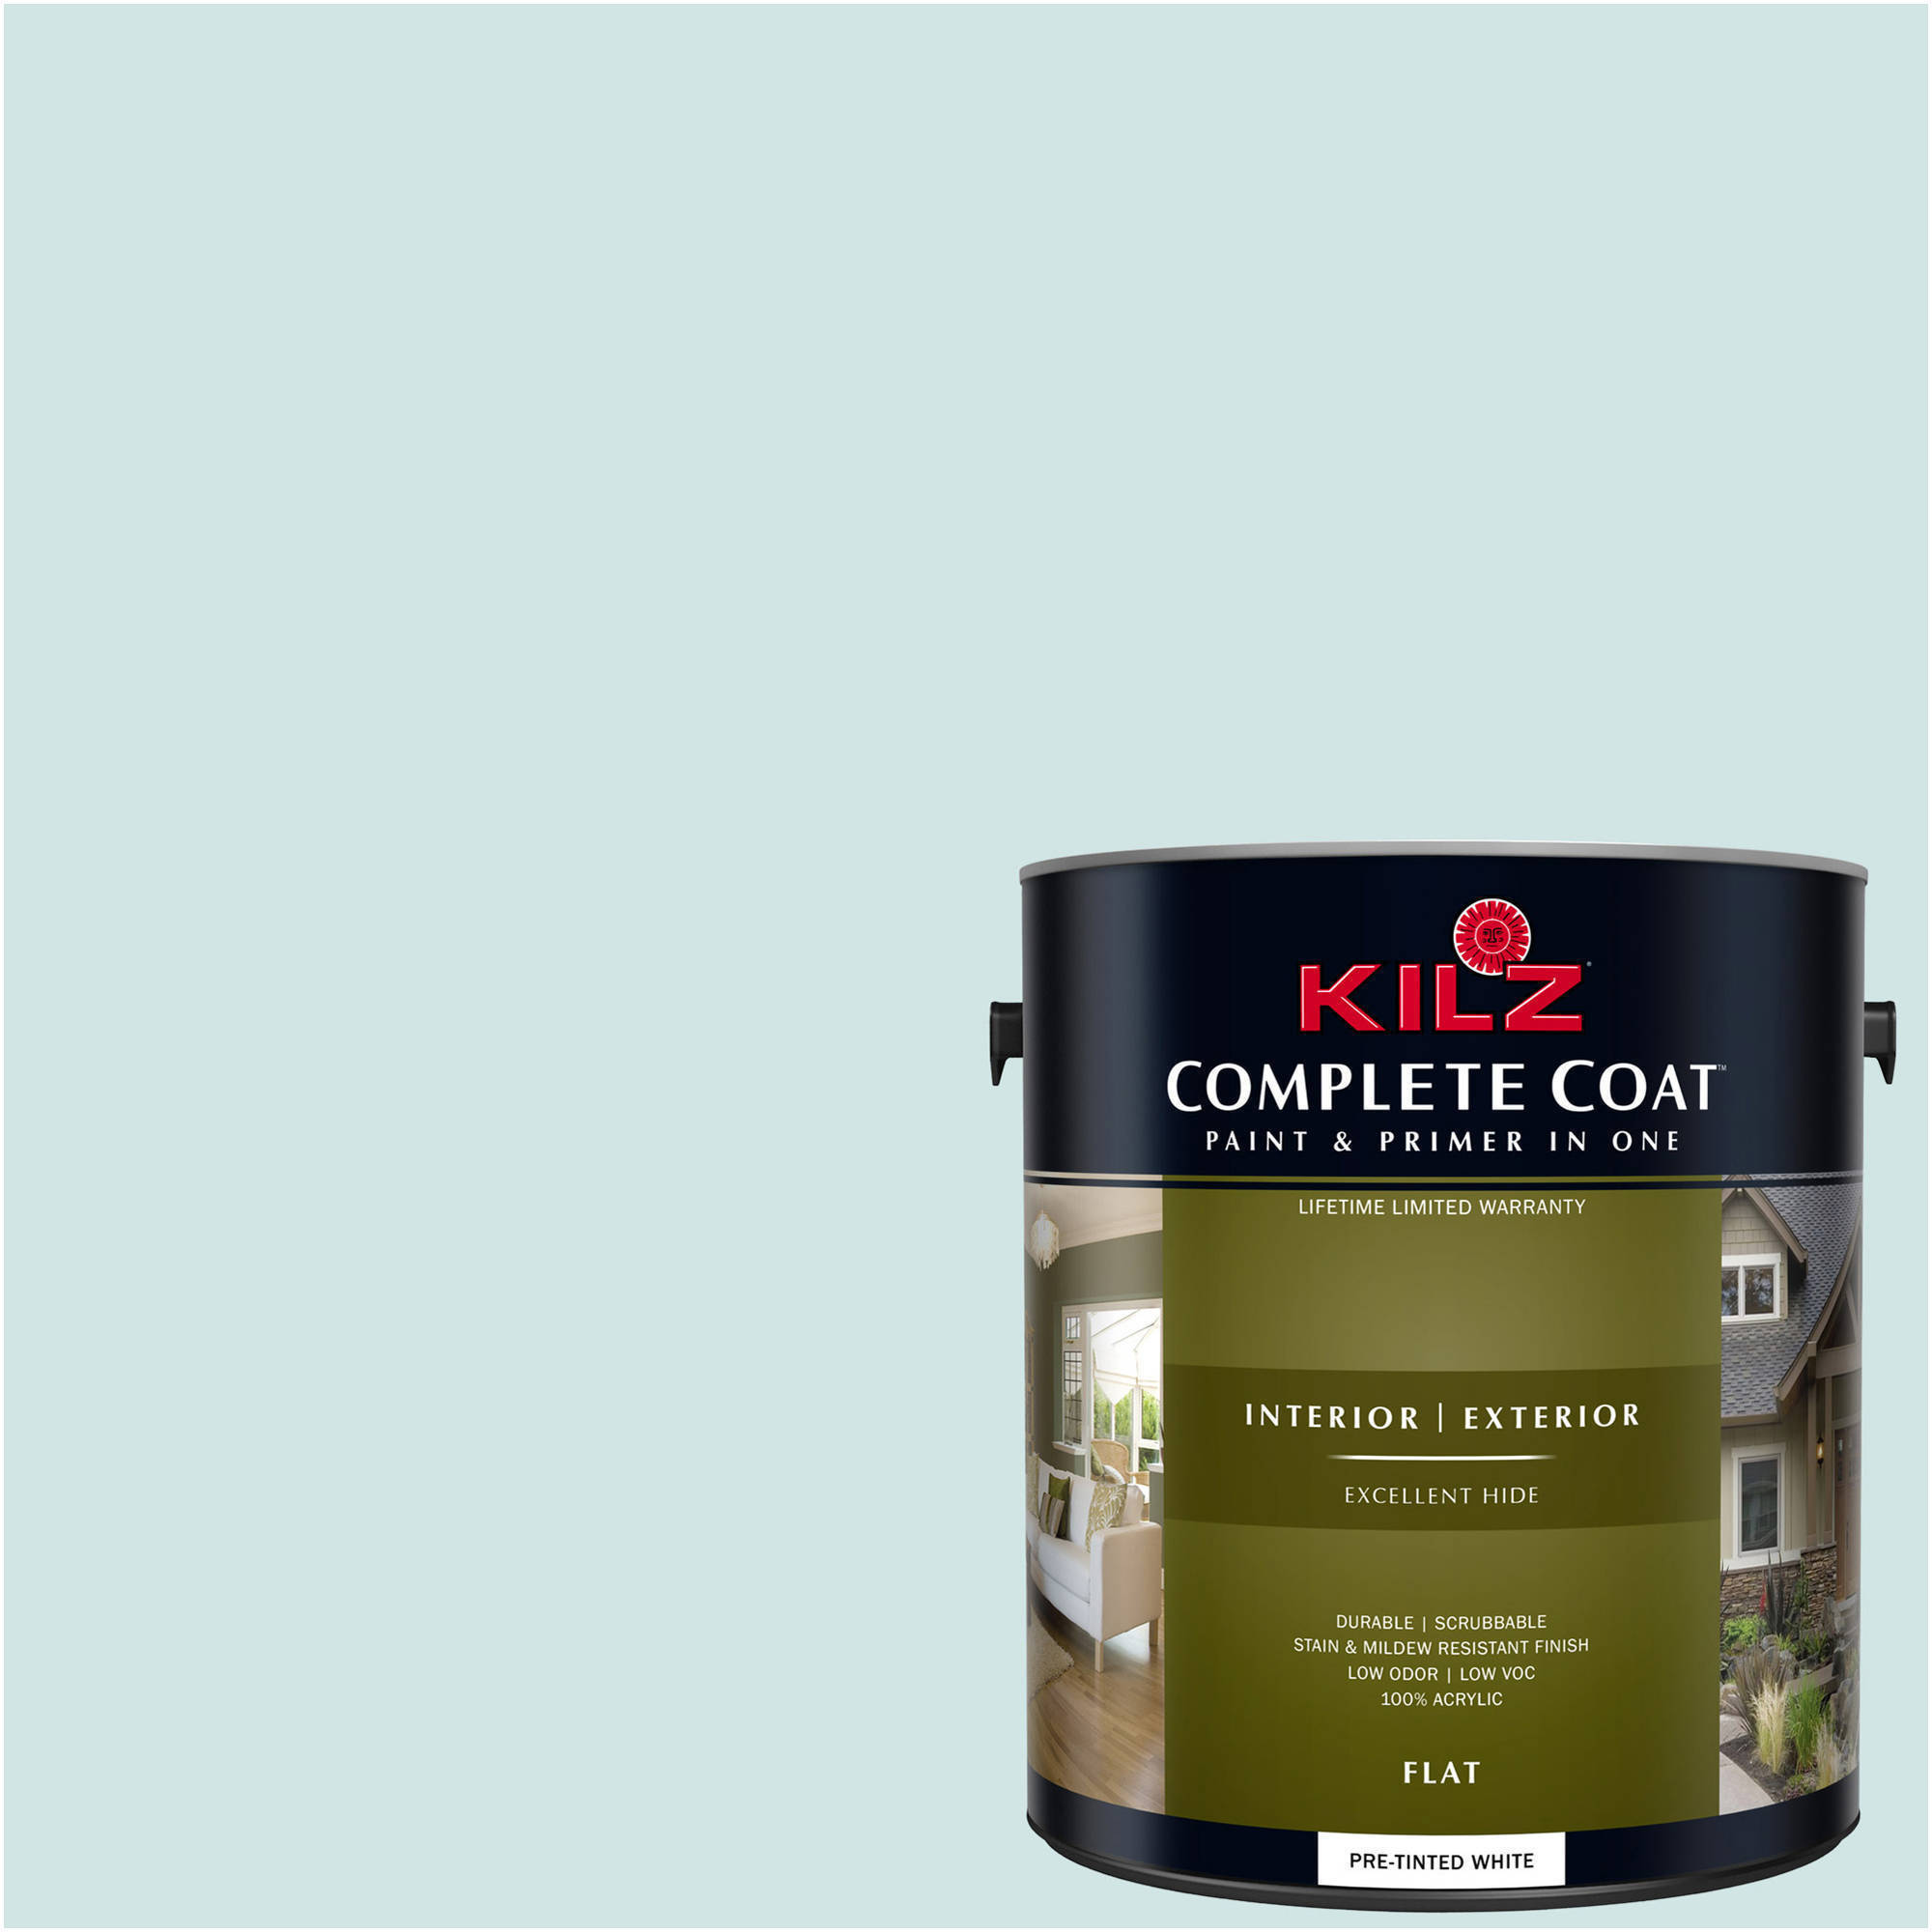 KILZ COMPLETE COAT Interior/Exterior Paint & Primer in One #RG180-01 Sea Glass